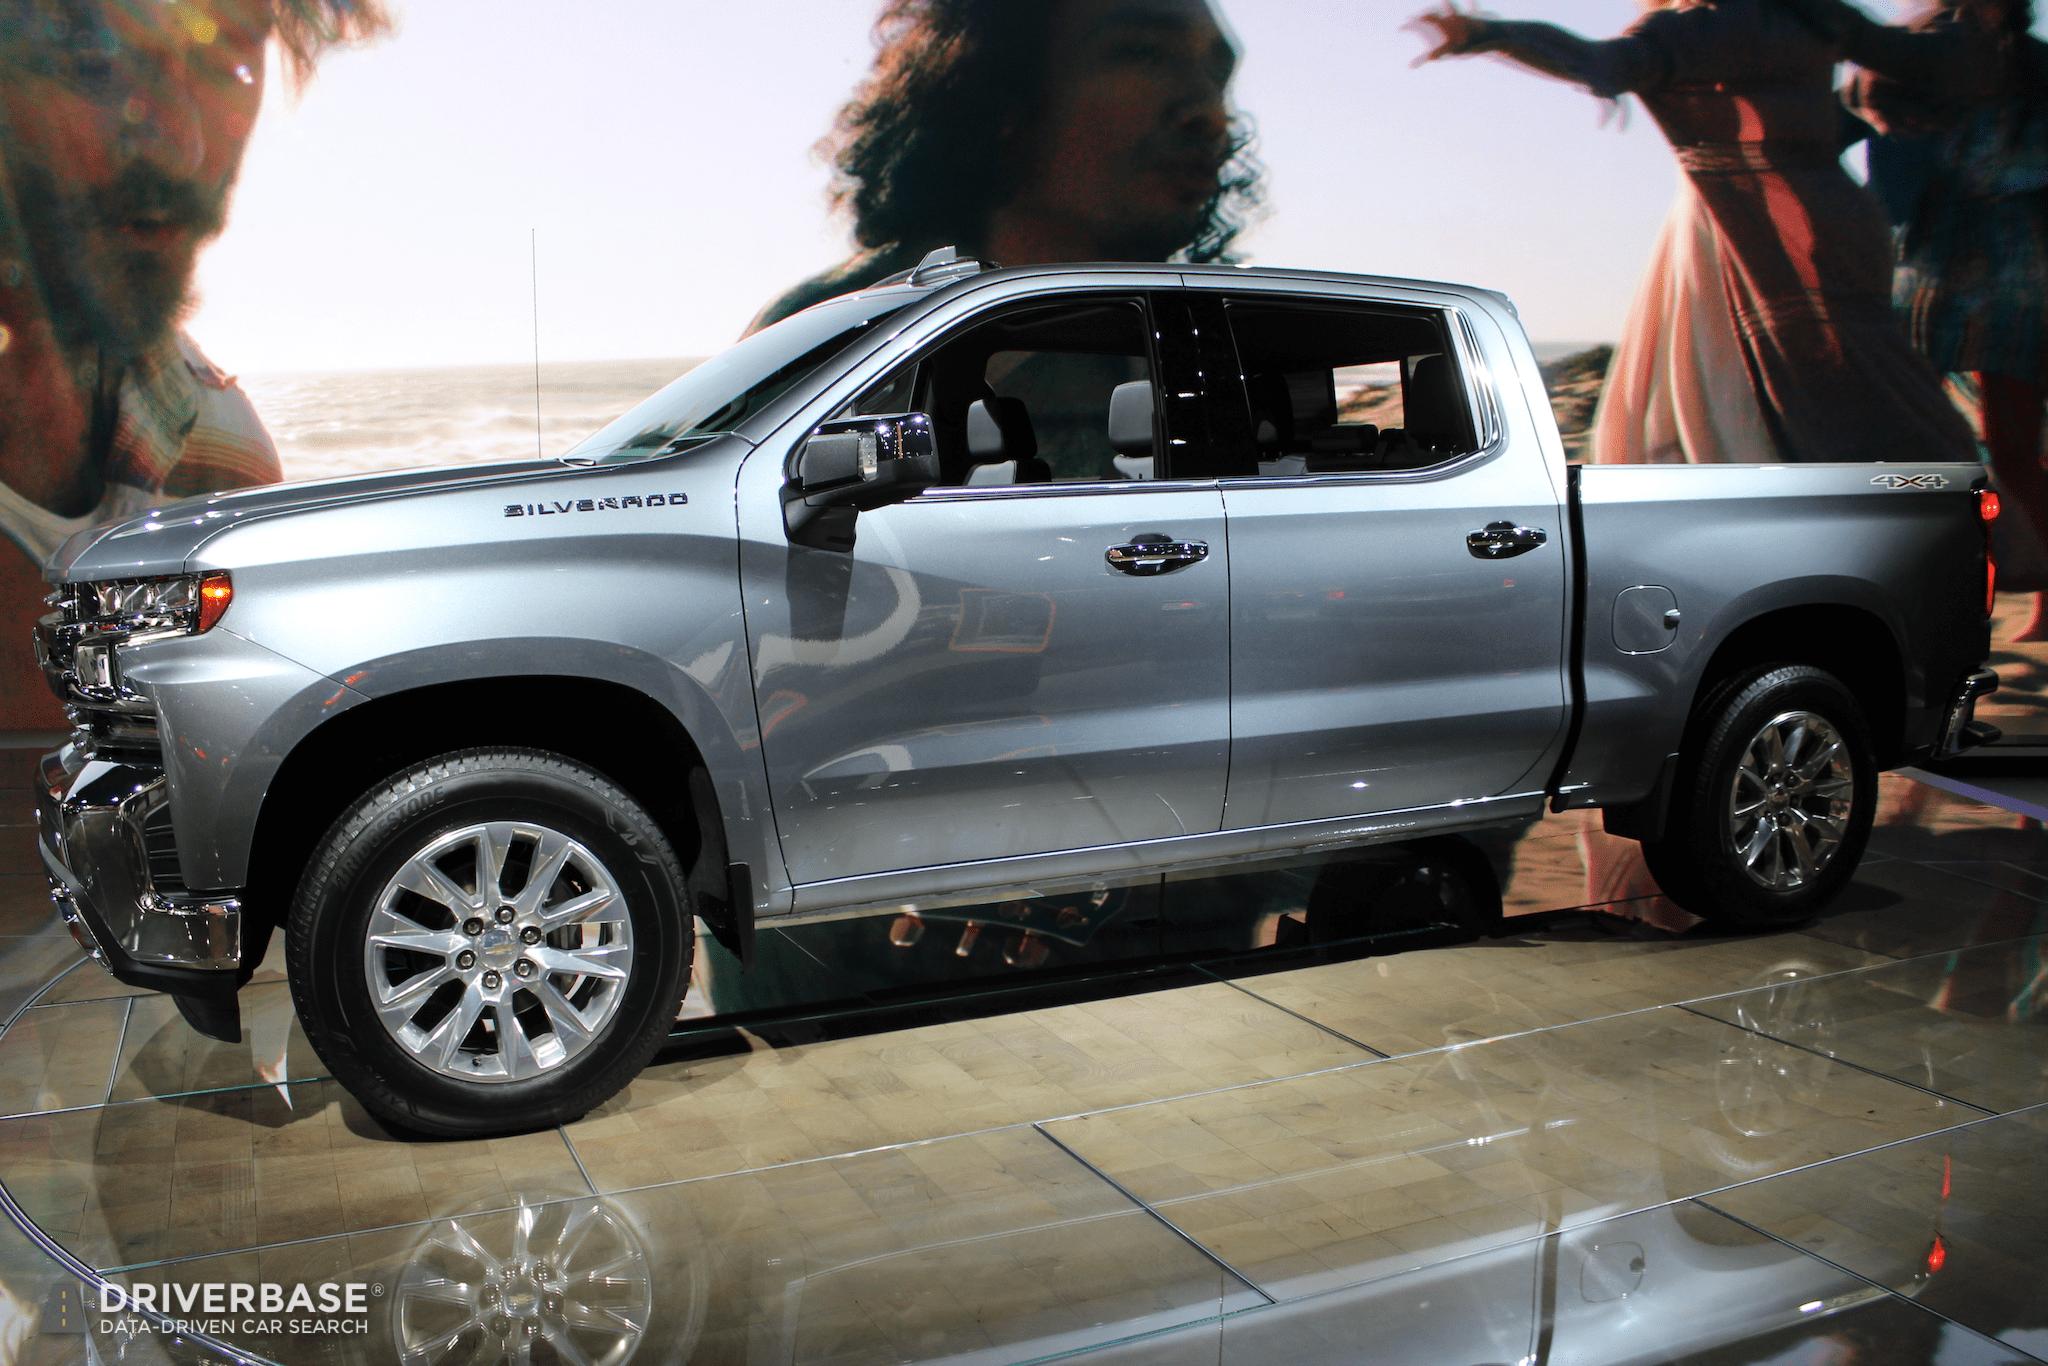 Truck – Driverbase